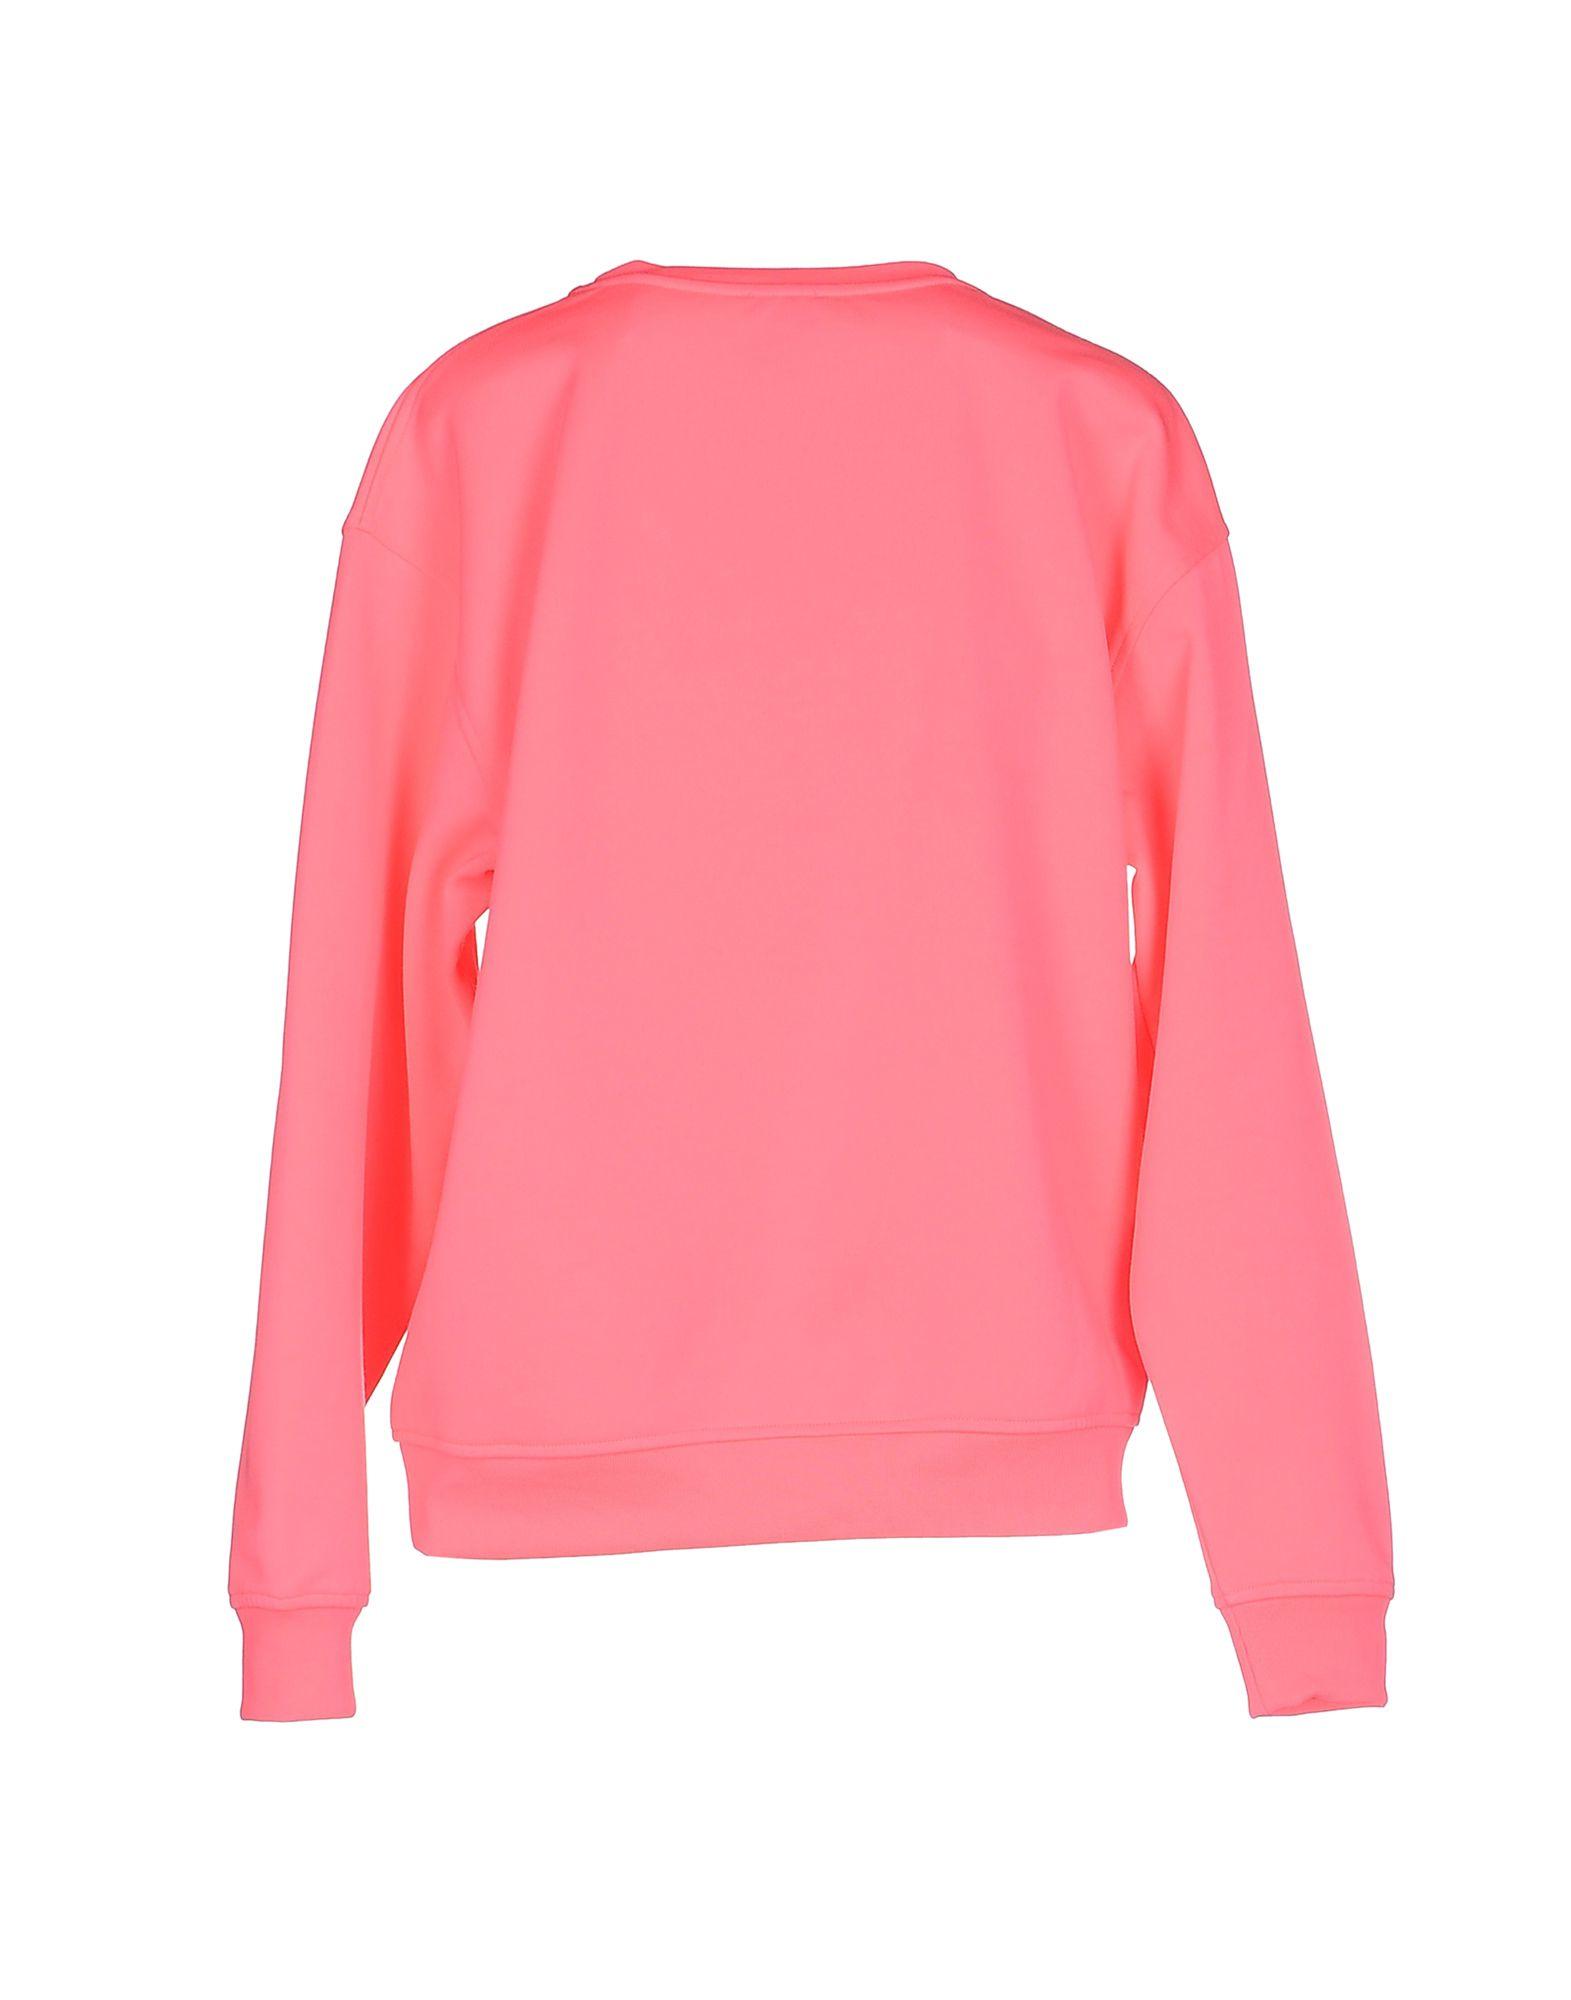 mcq alexander mcqueen sweatshirt in pink fuchsia lyst. Black Bedroom Furniture Sets. Home Design Ideas